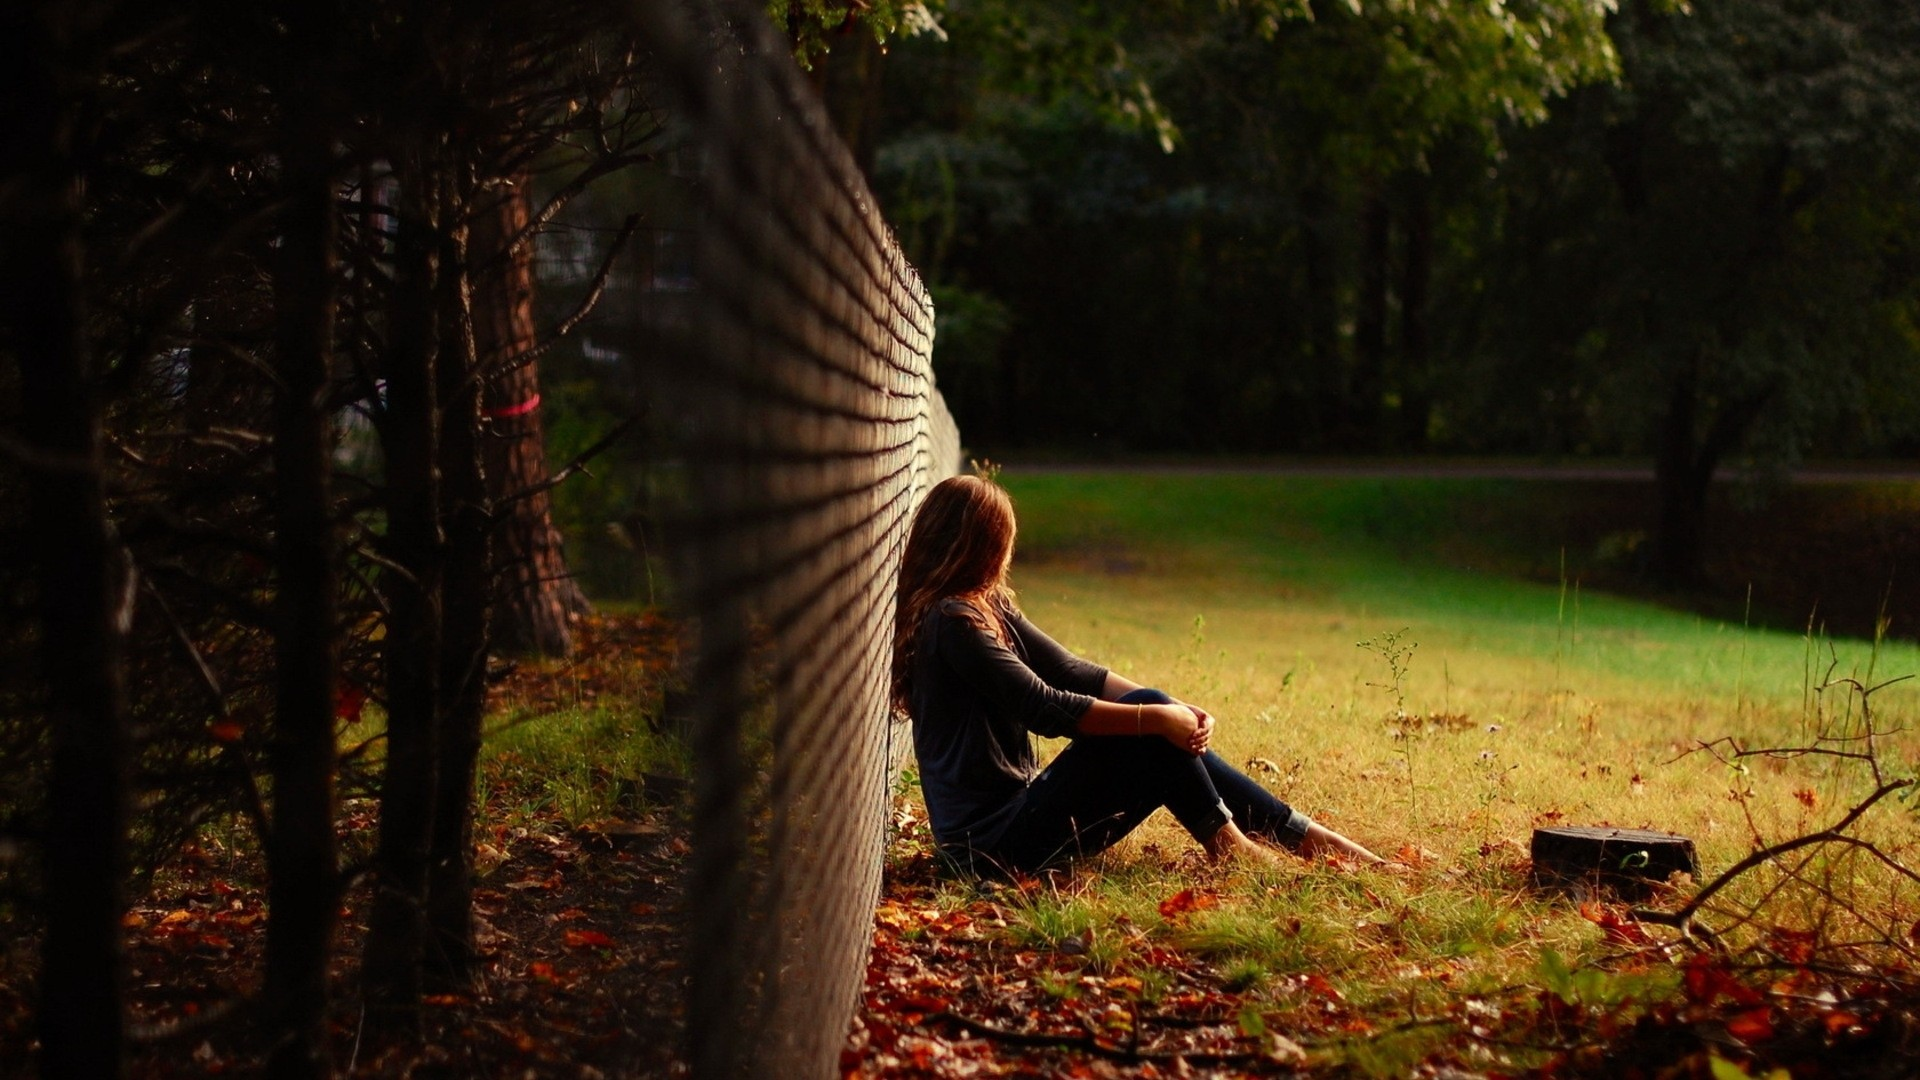 Alone Sad Wallpaper image hd